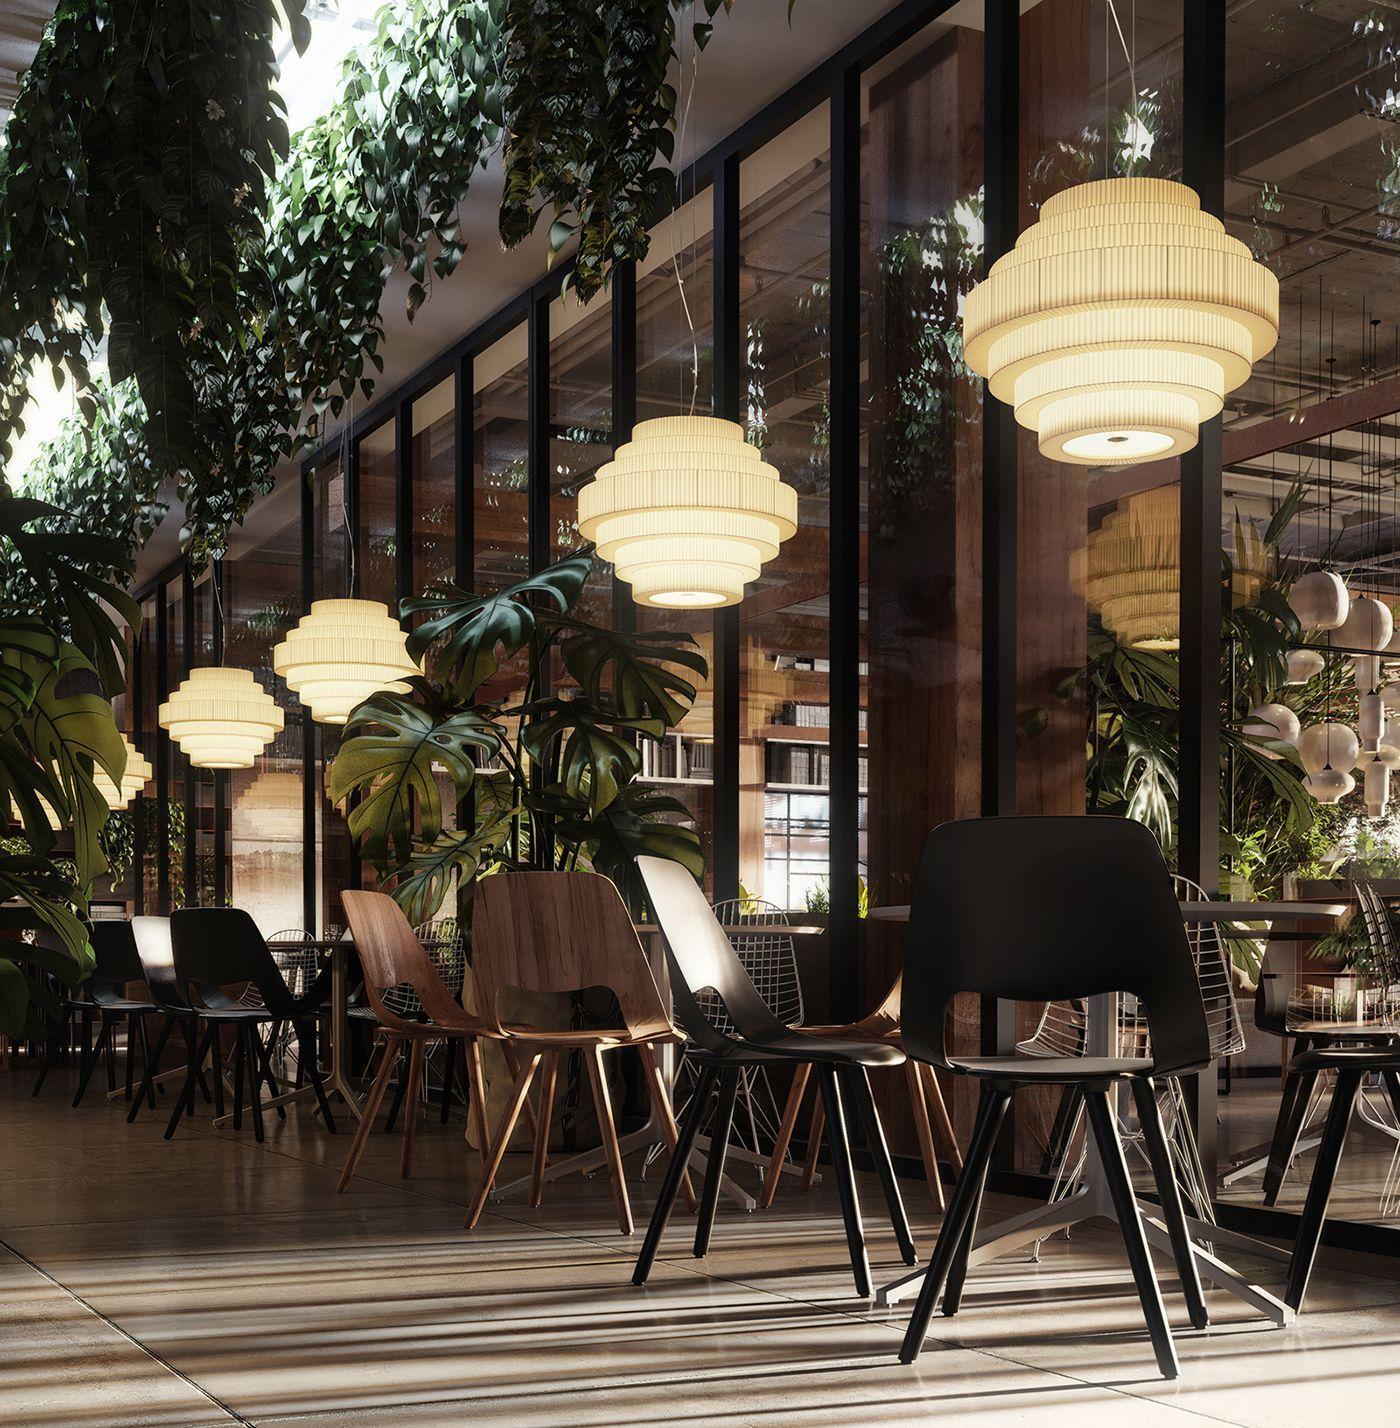 Restaurant In Almaty Almaty Restaurant In 2020 Luxury Restaurant Outdoor Restaurant Restaurant Design